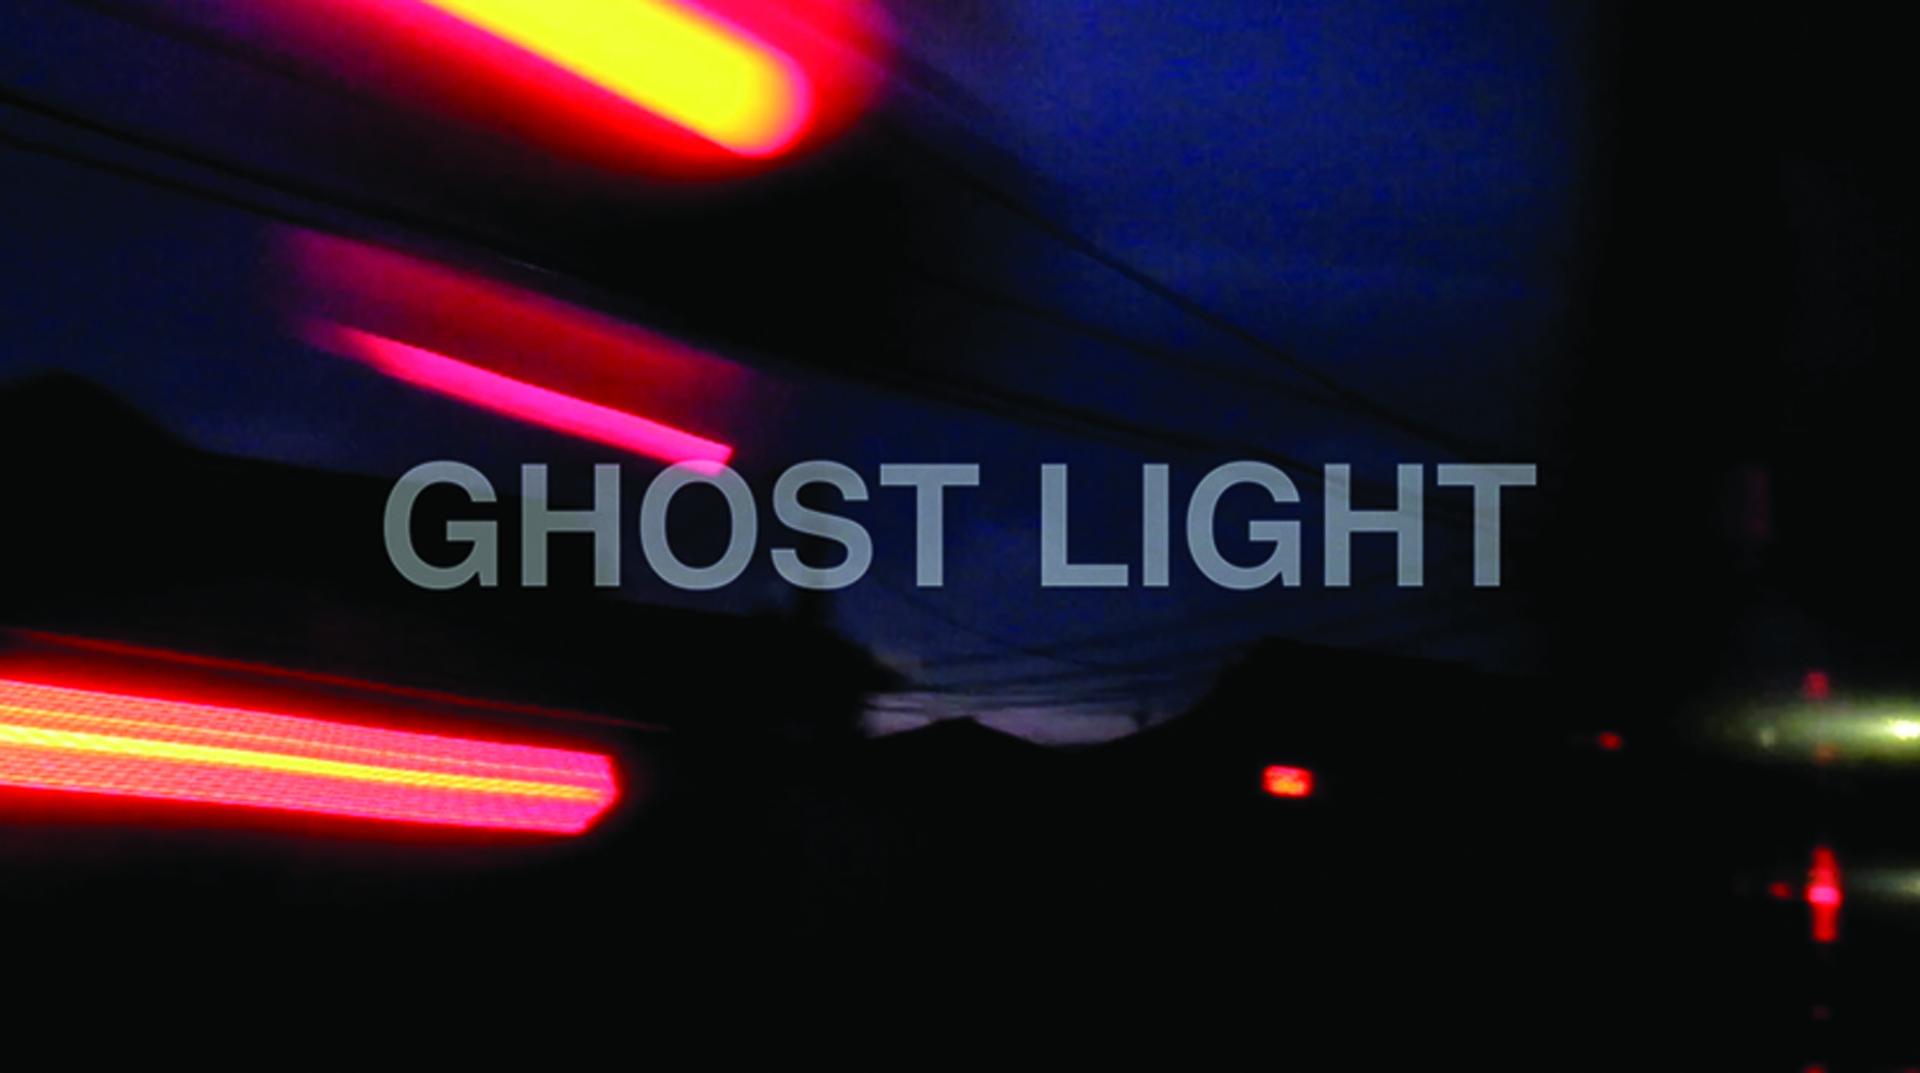 ©2015, Luke Pendrell, Ingis Fatuus (Ghost Light)